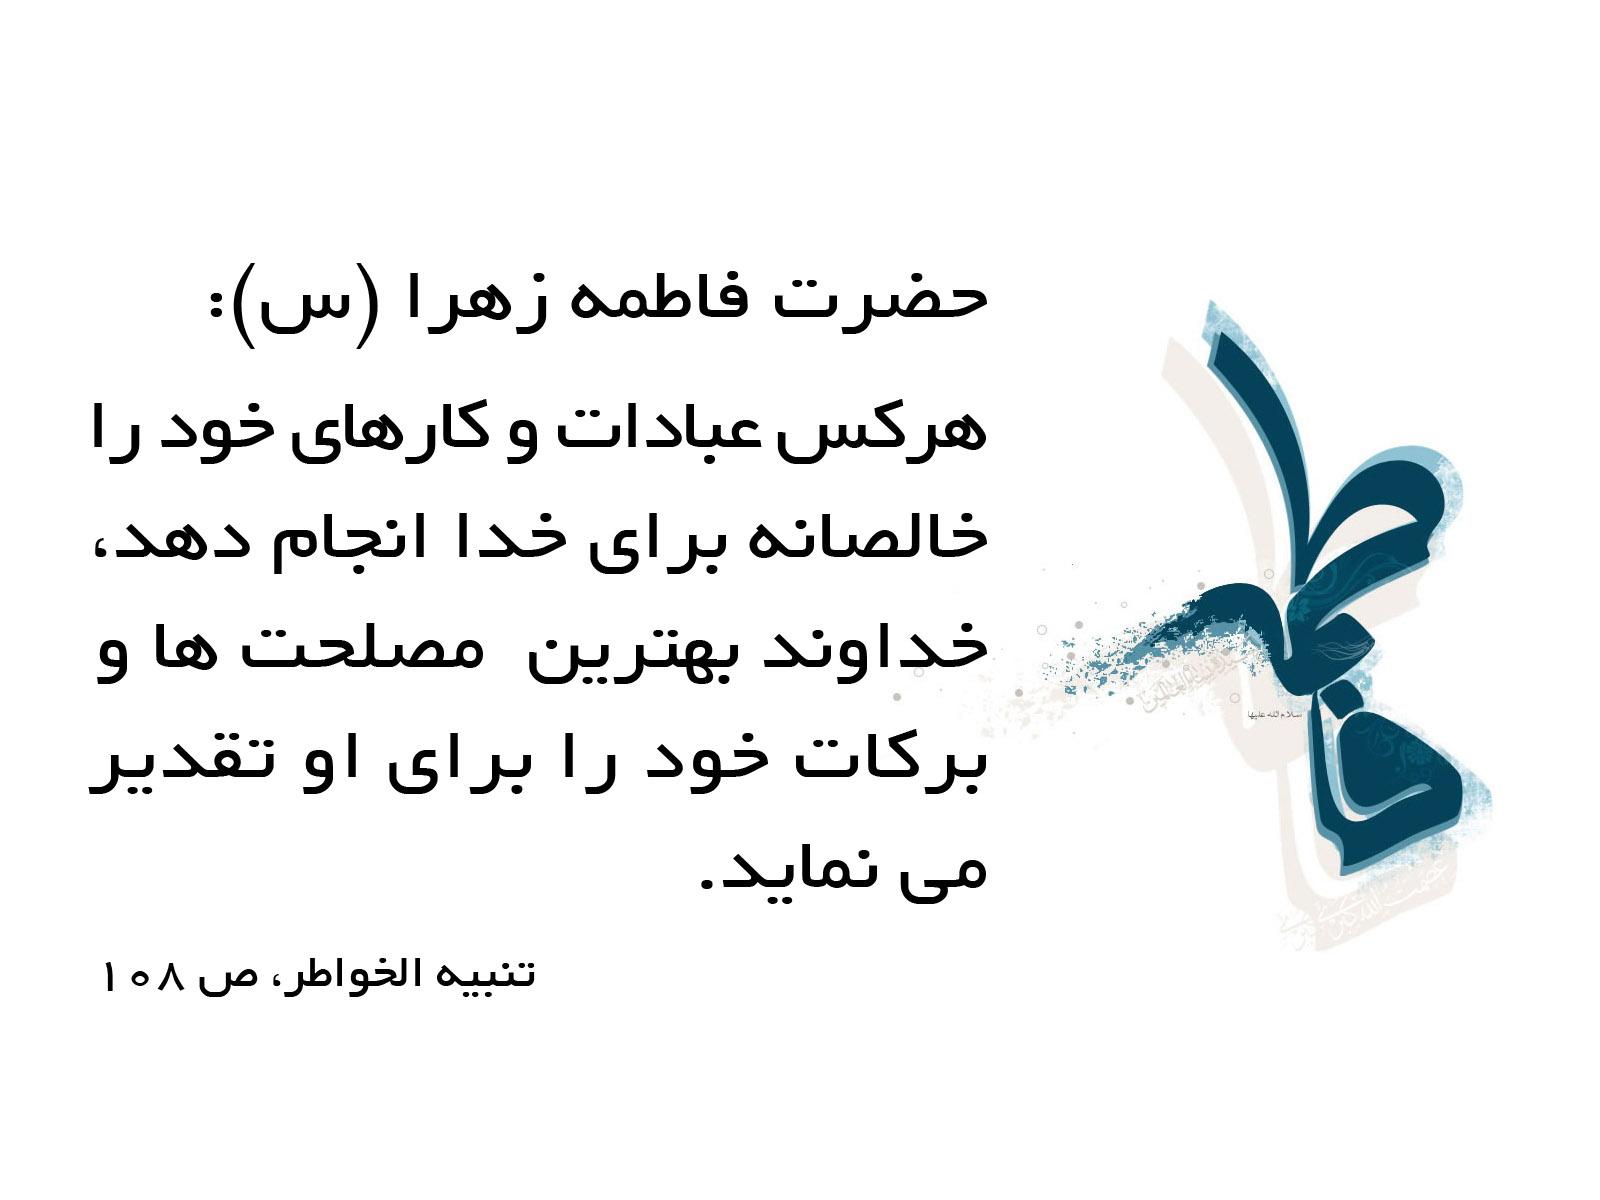 http://bayanbox.ir/view/2508334744364036691/fatima-Hadith-1.jpg